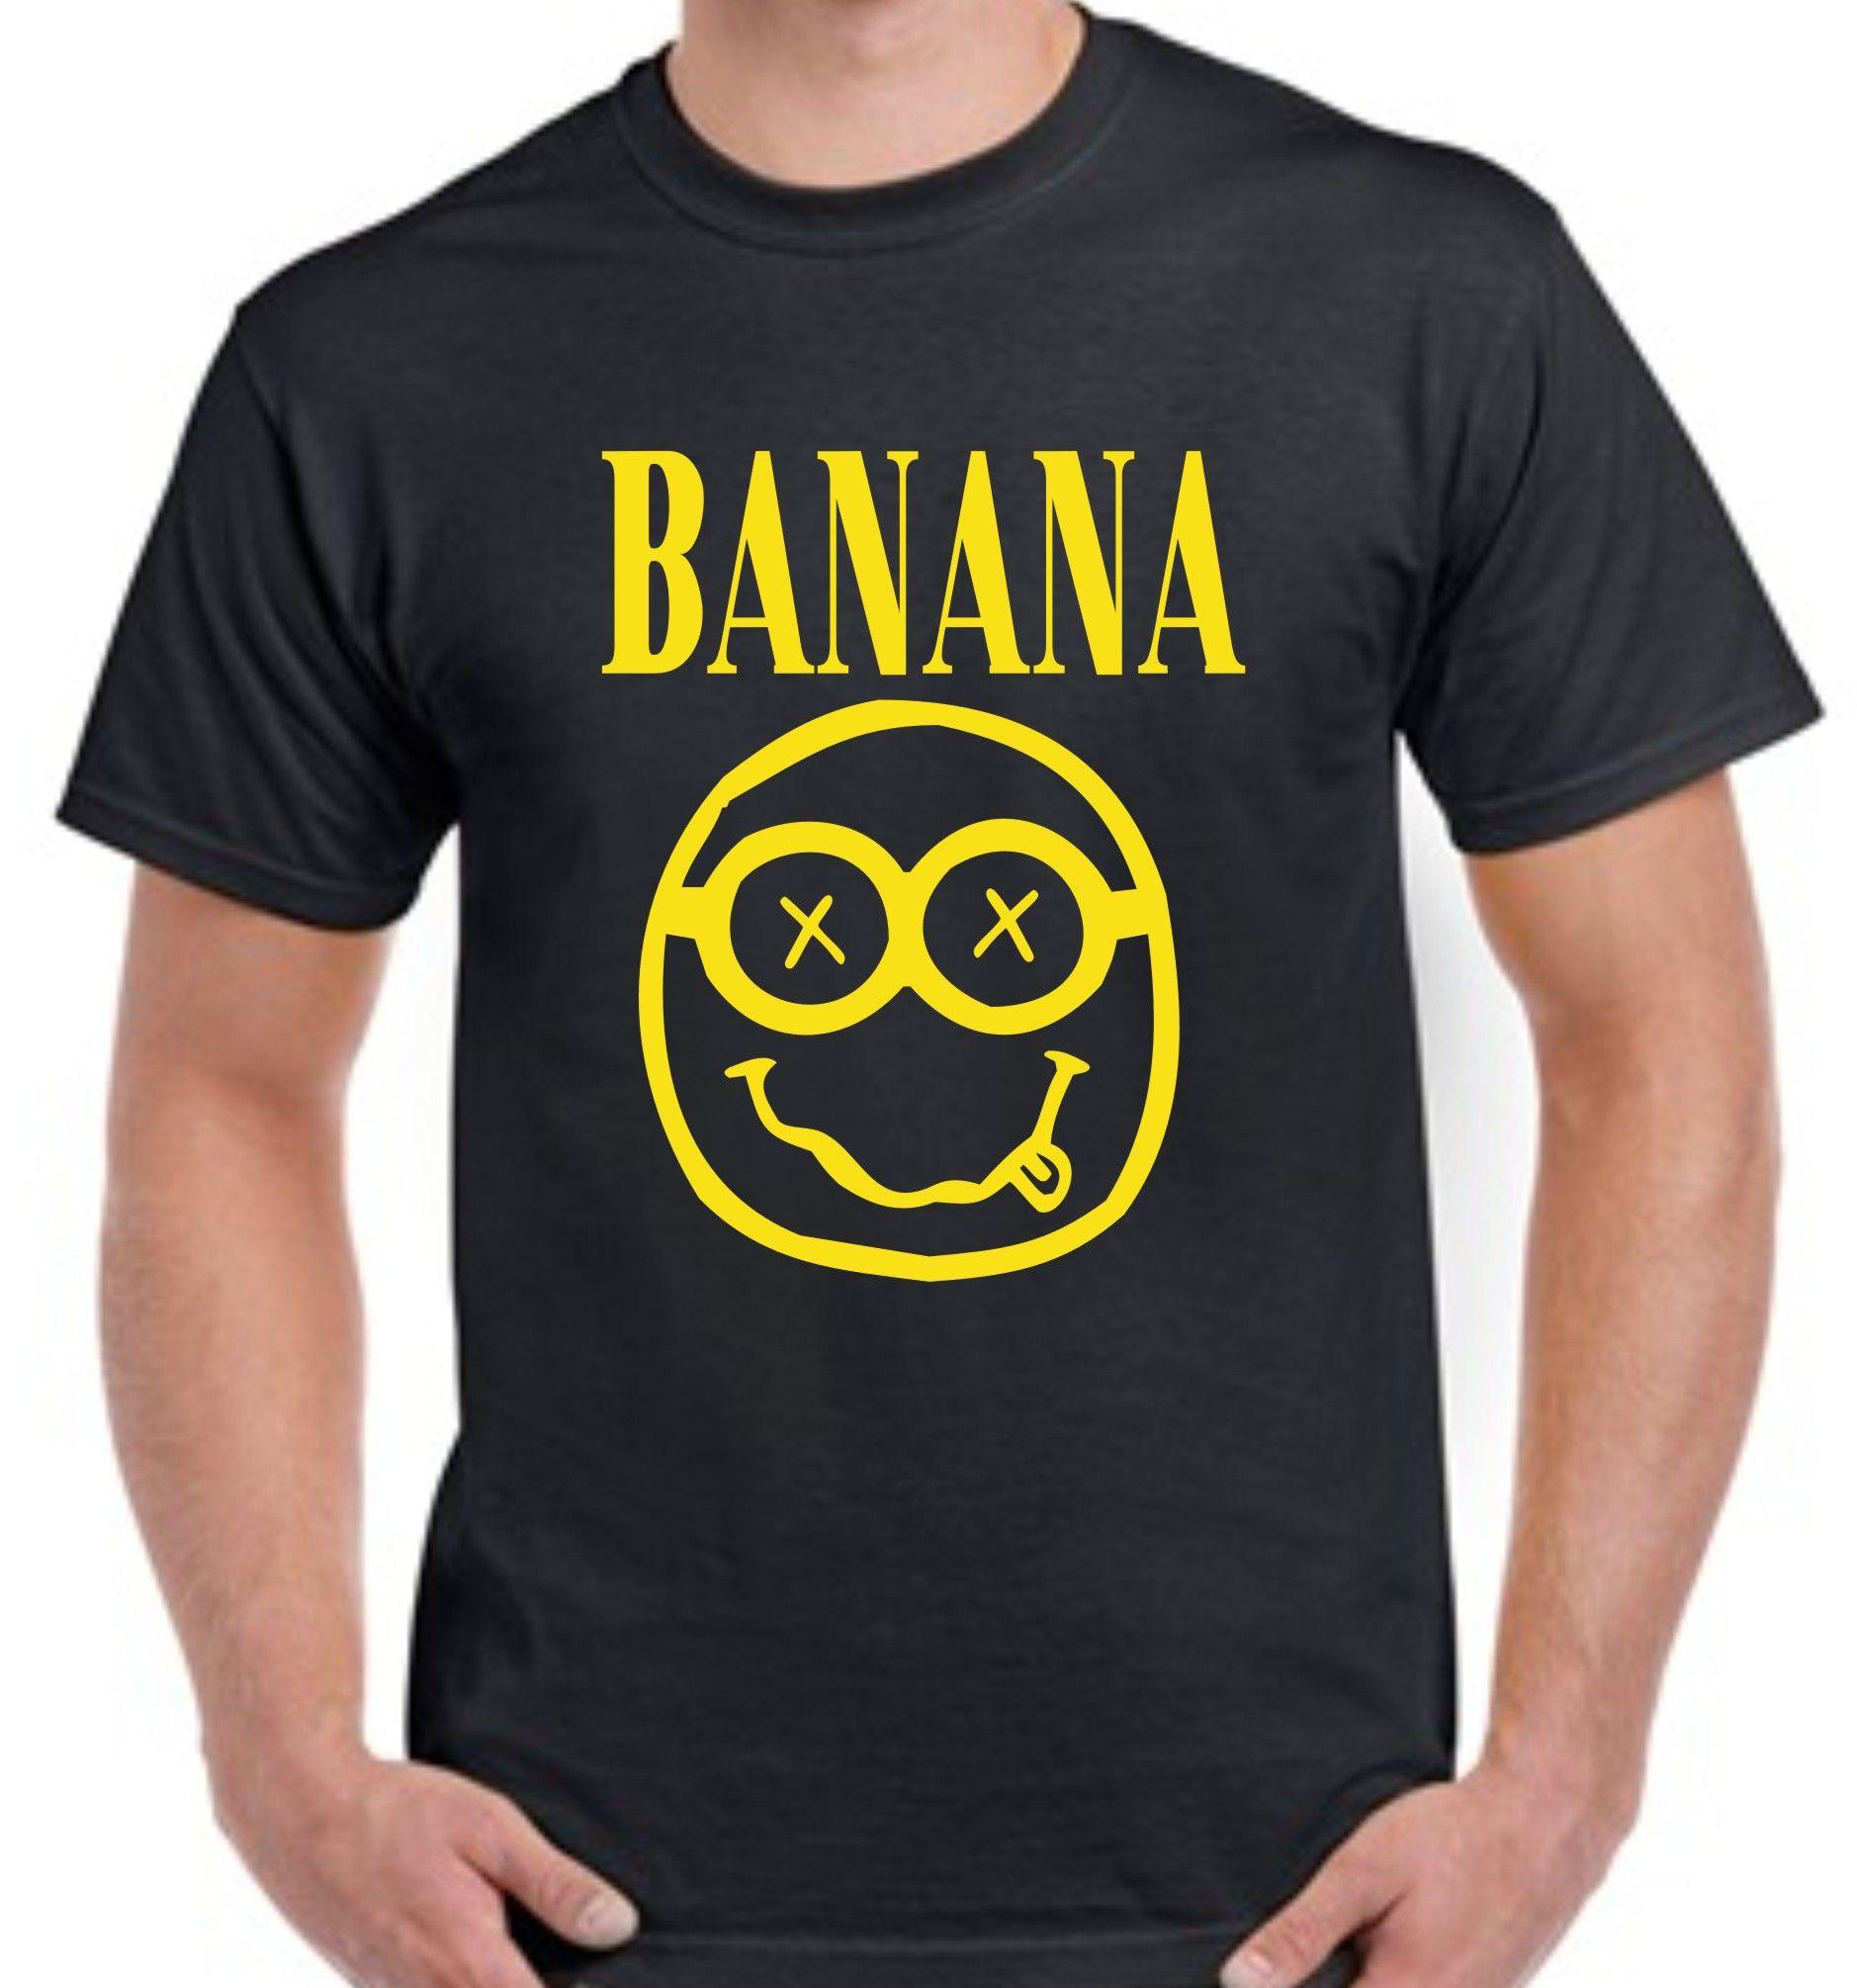 881abb238a Banana Nirvana Minion Mash up T shirt | clothes | Mens tops, T shirt ...